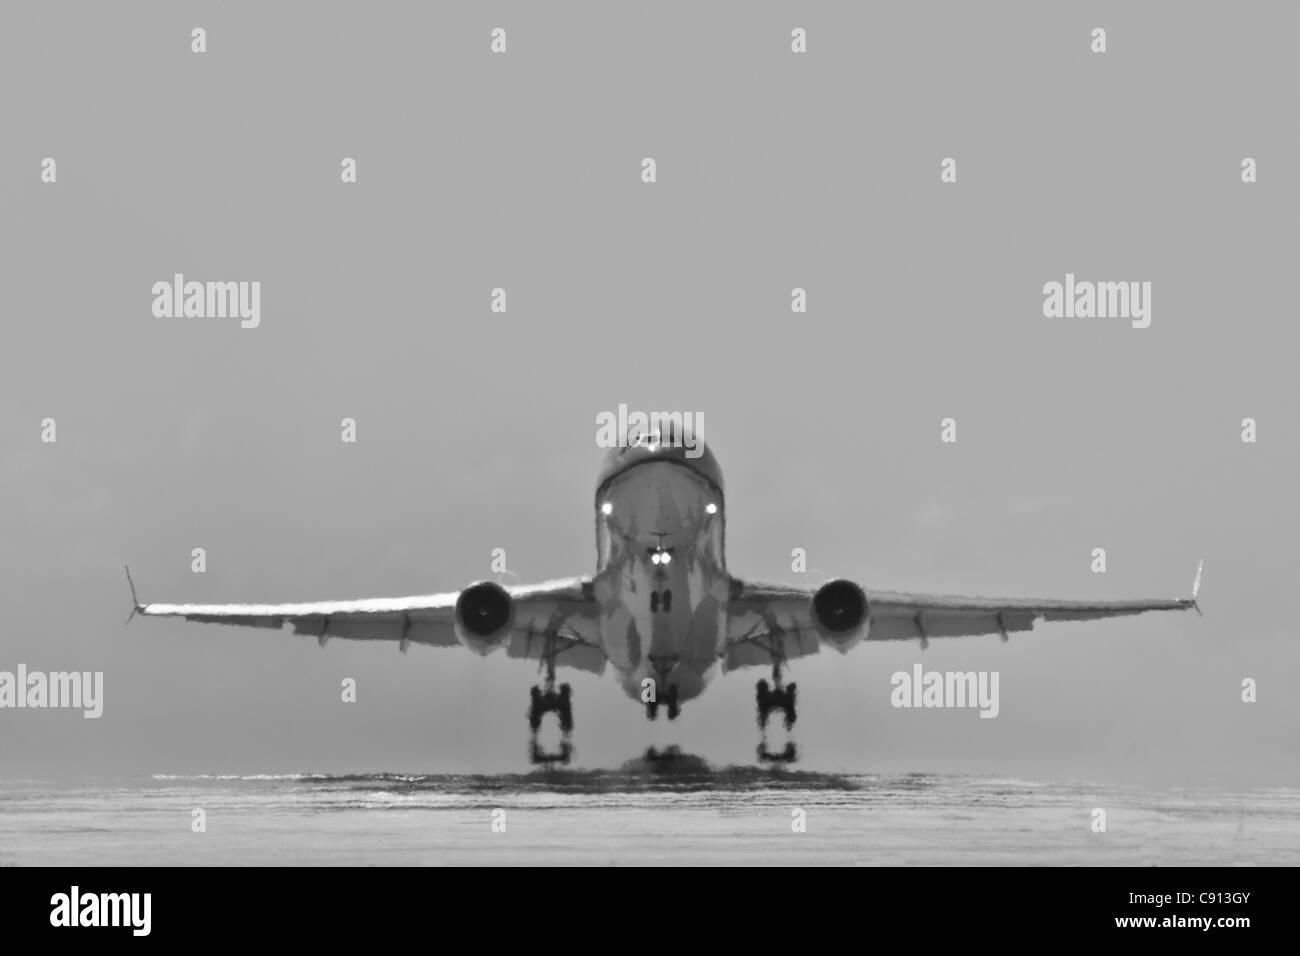 Bonaire Island, Dutch Caribbean, Kralendijk, KLM Douglas DC-10 airplane, taking off from Flamingo Airport. Black - Stock Image